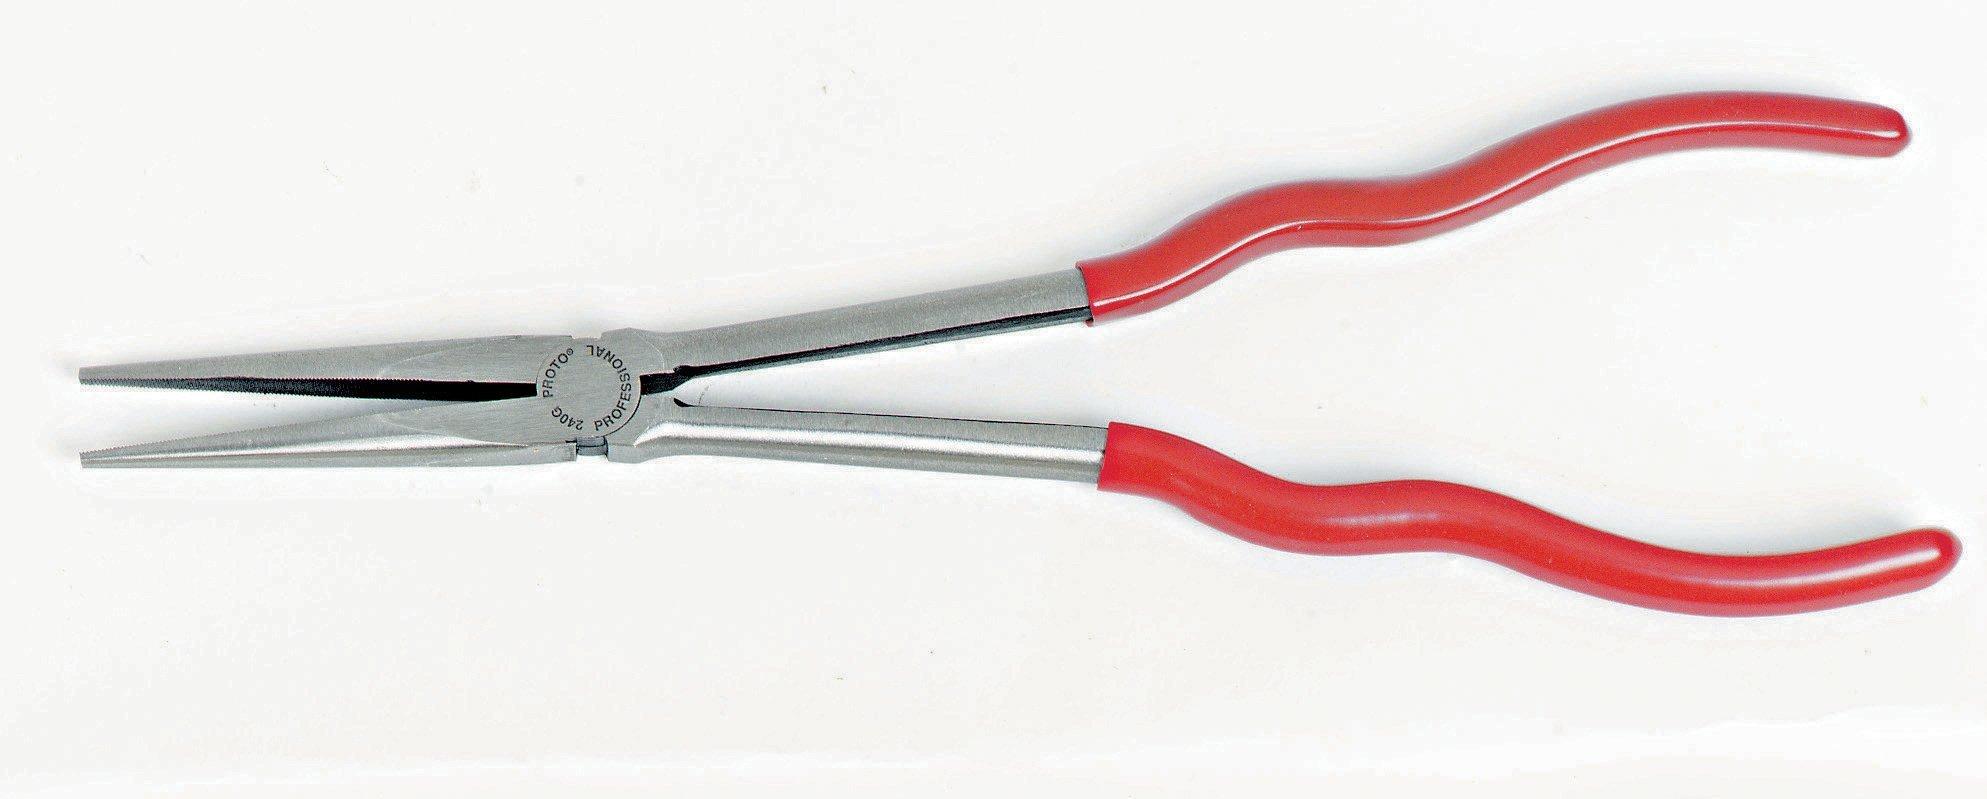 Stanley Proto J240G Proto 11-9/16-Inch Needle-Nose Pliers, Long Reach